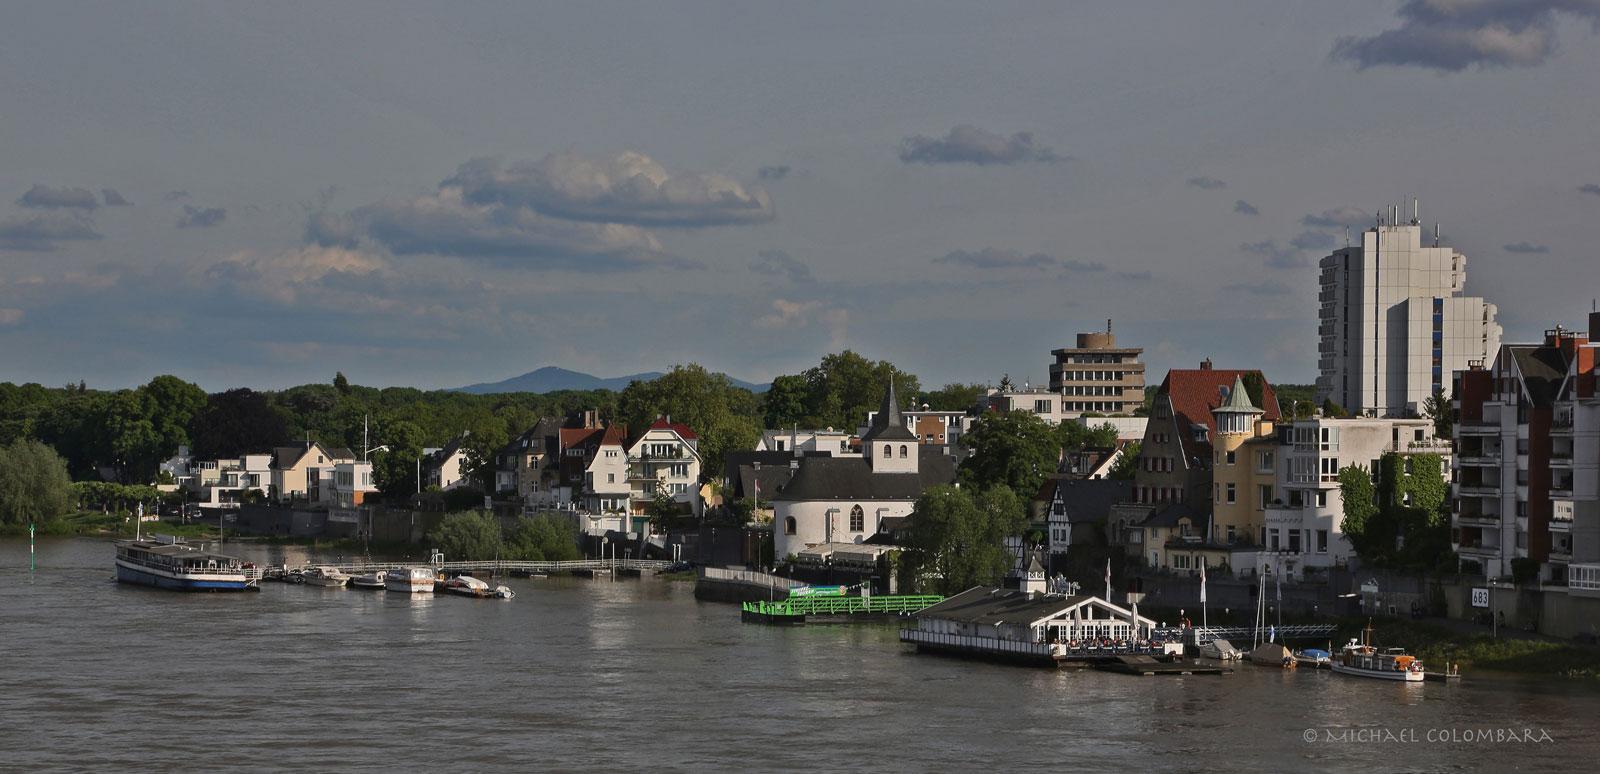 Köln Rodenkirchen am Rhein